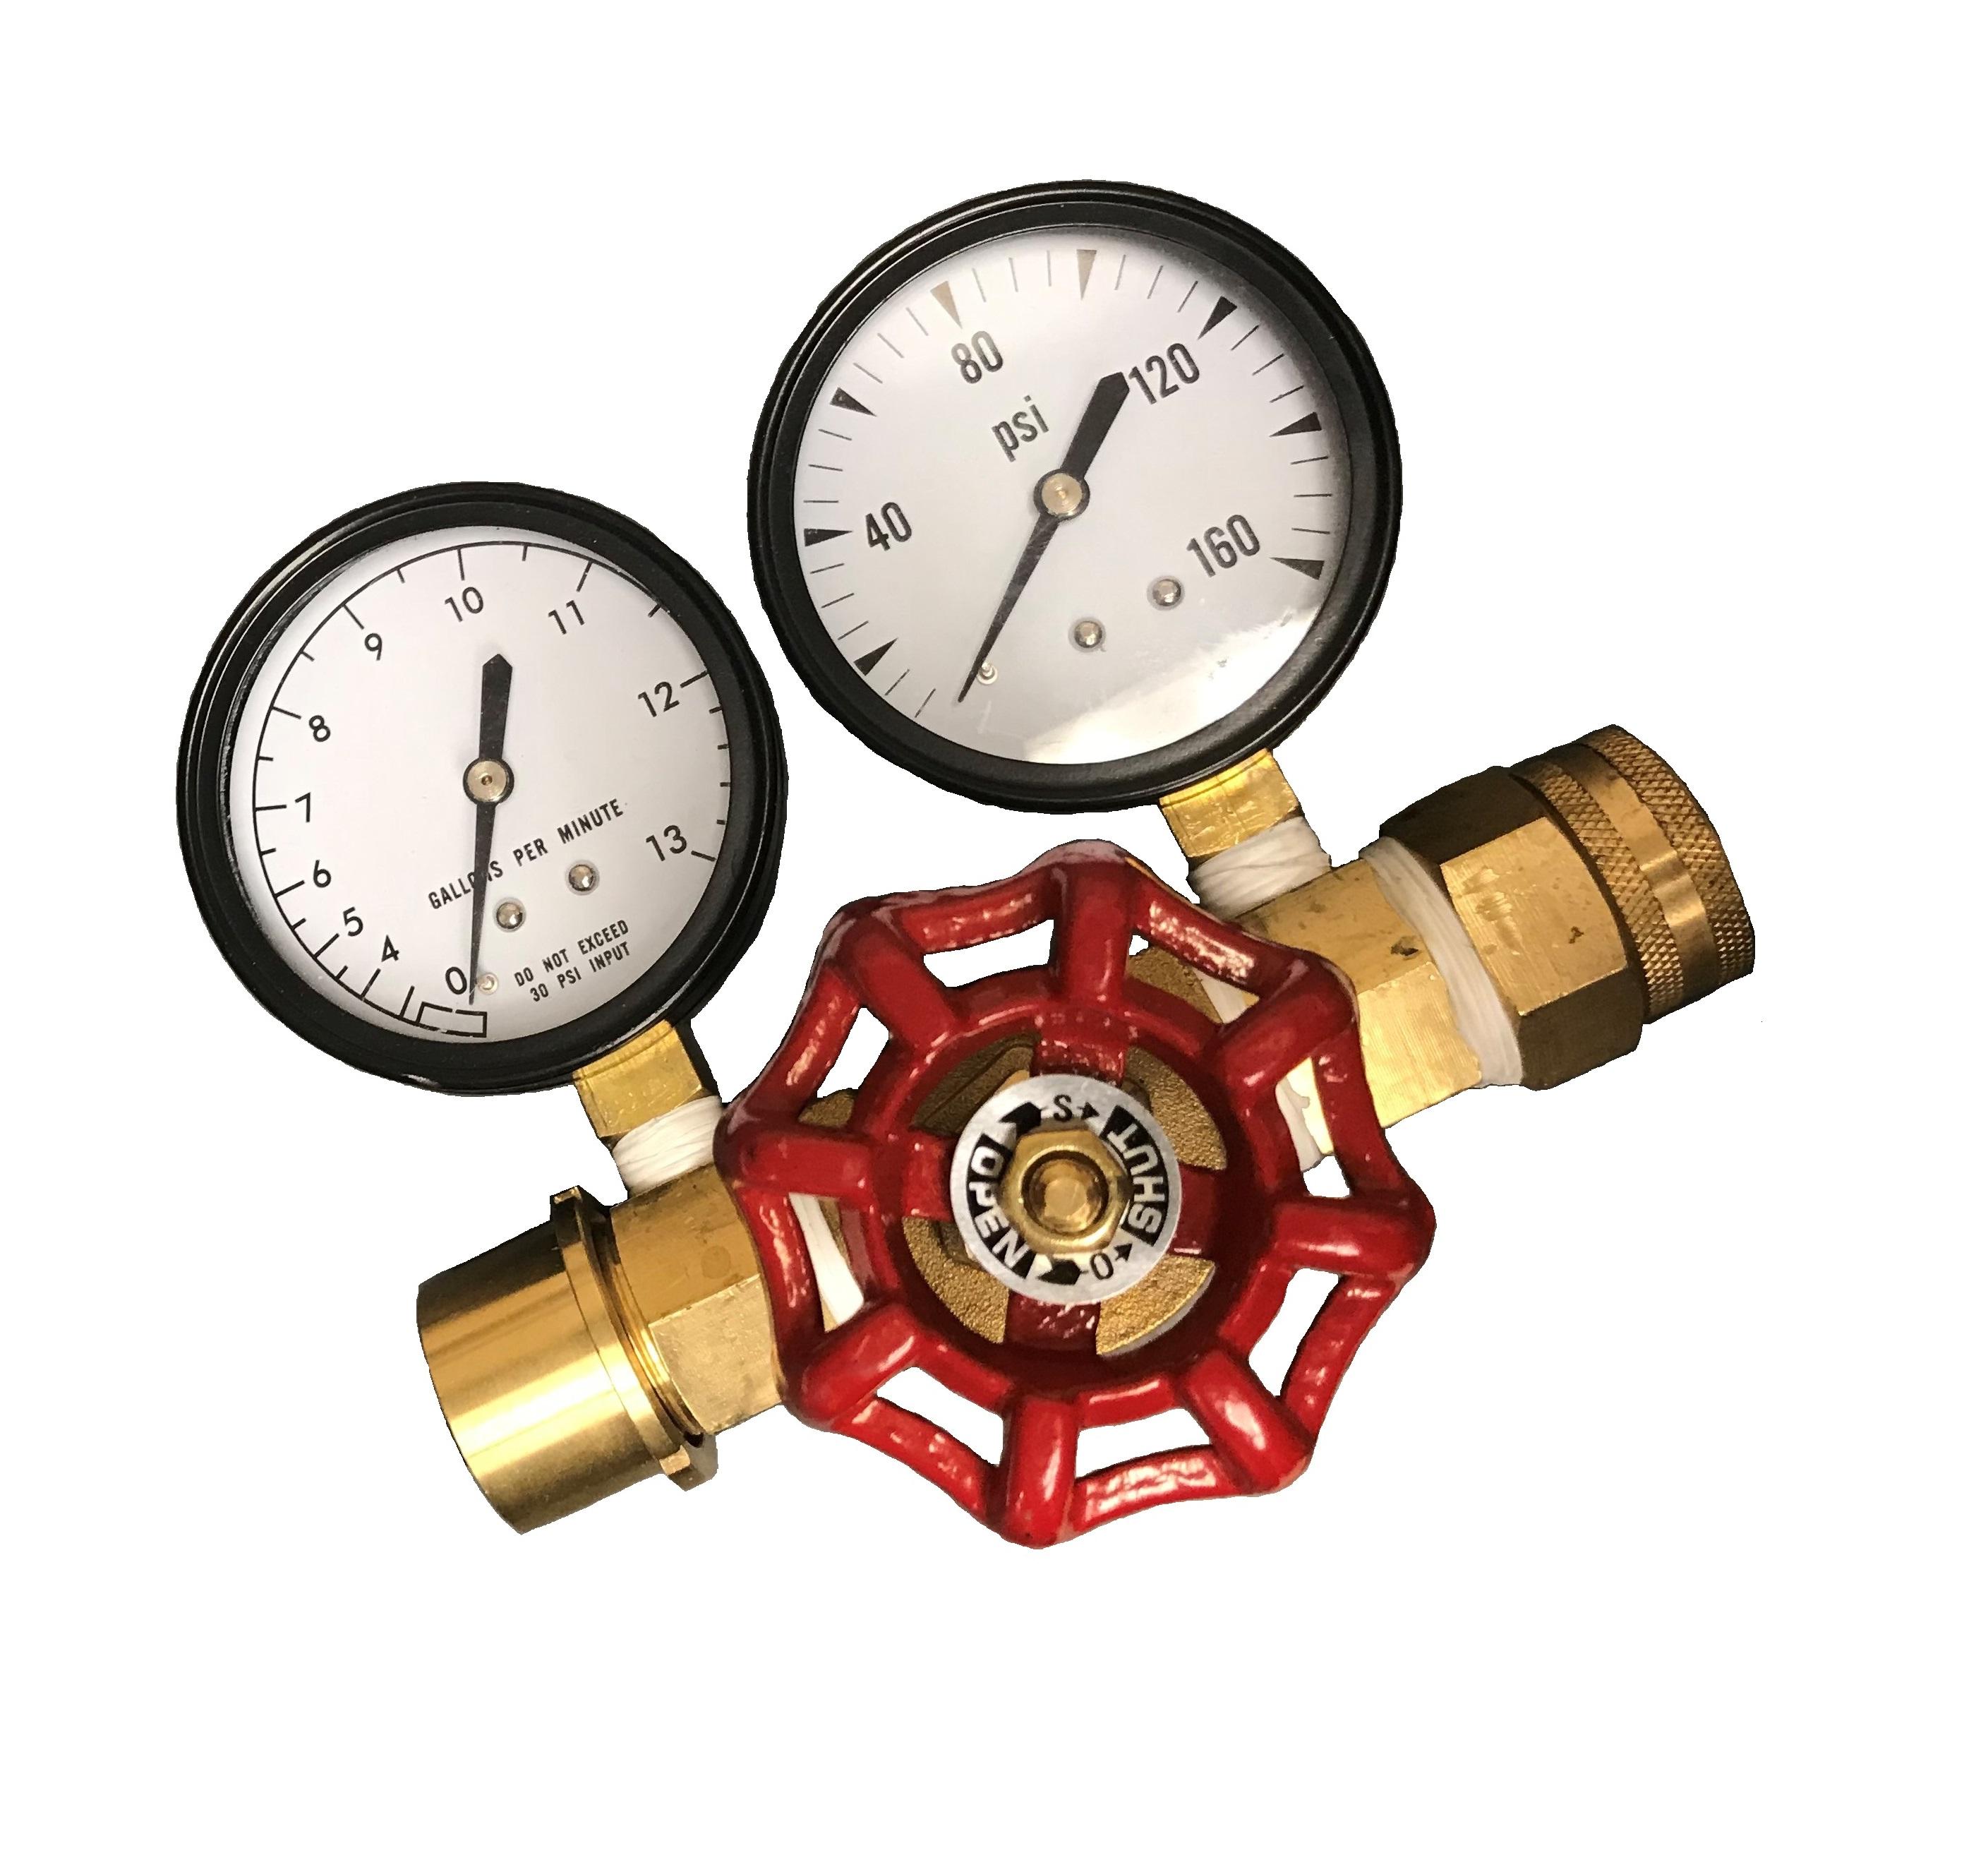 Residential Flow & Pressure Tester